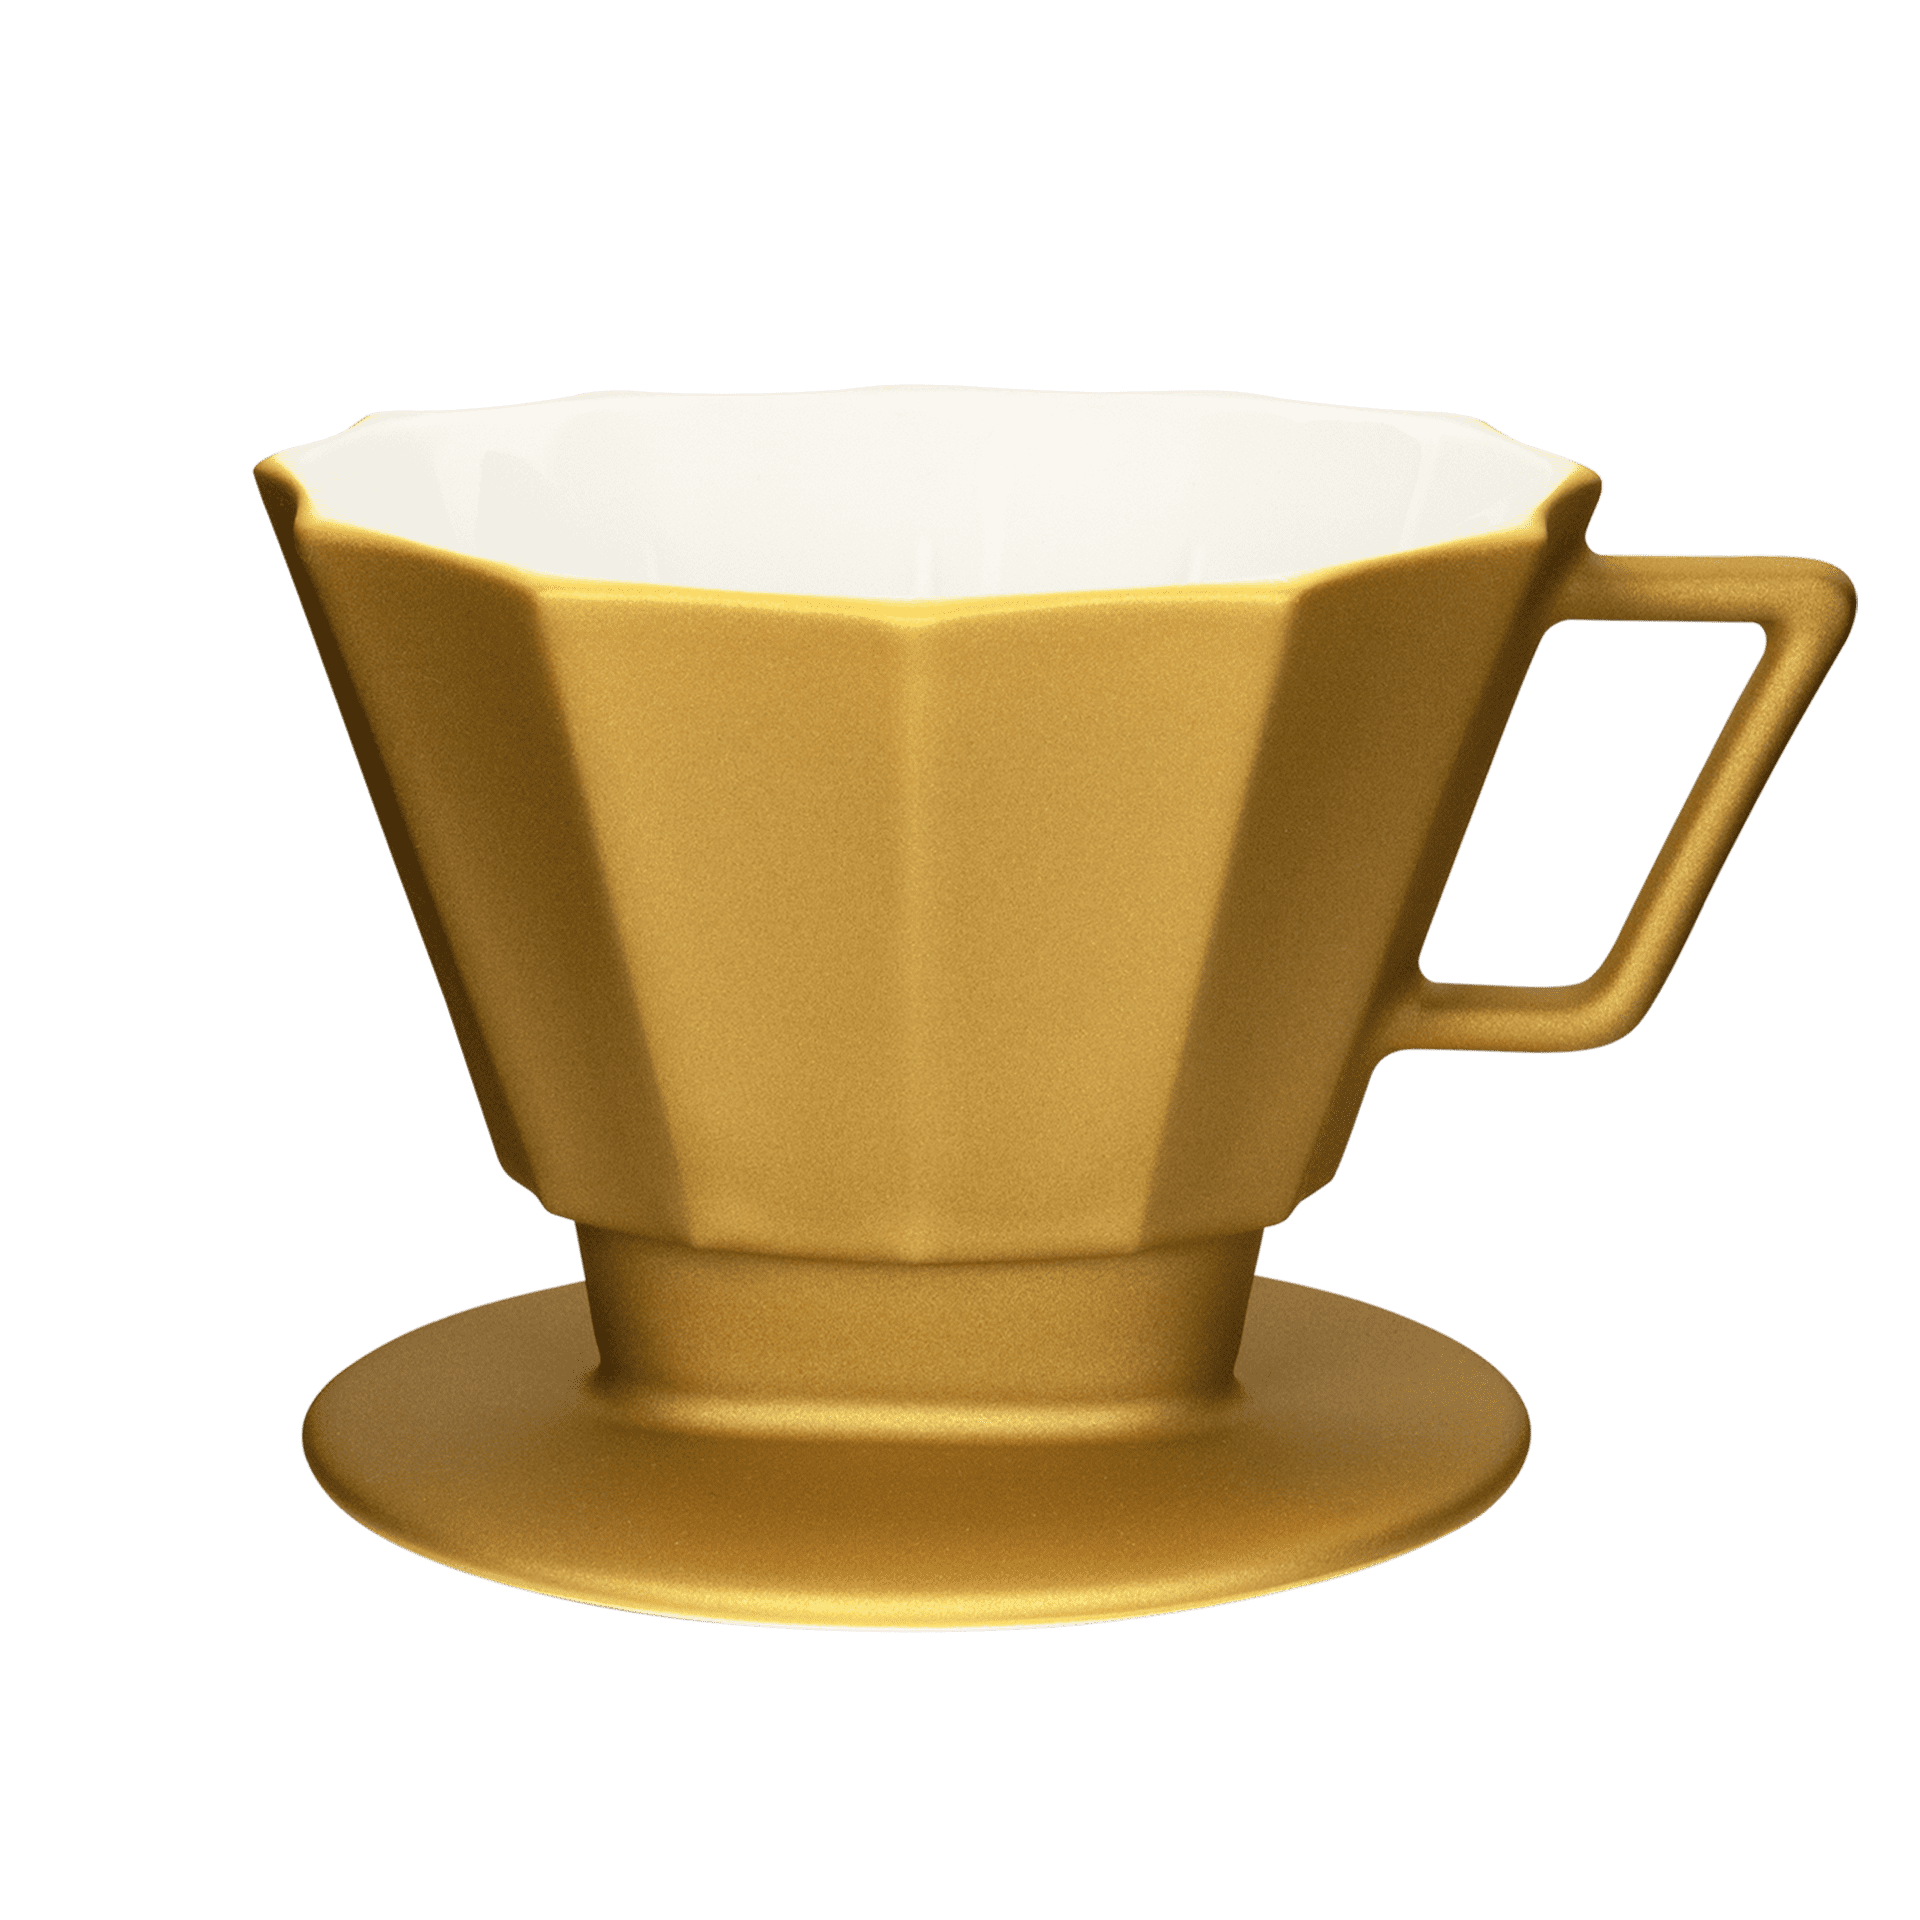 stylisher kaffee-filter im metallic look groesse 4 1x4